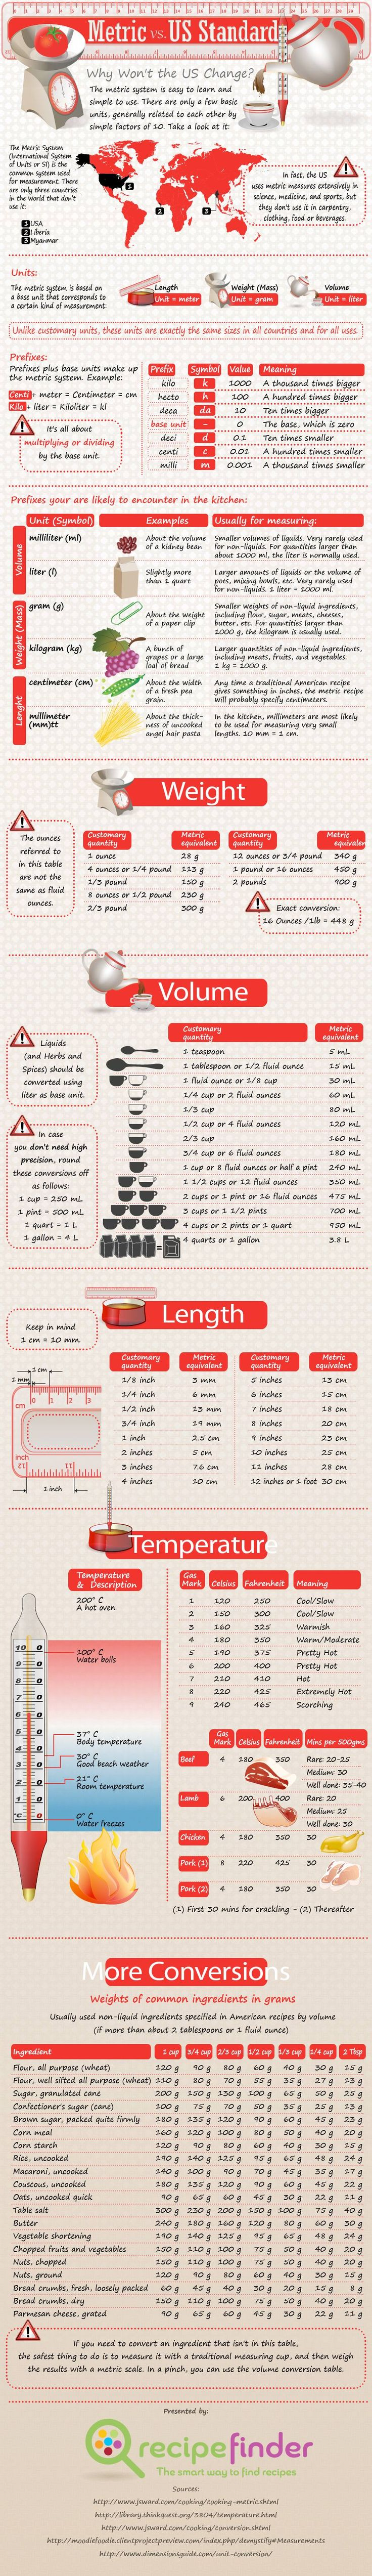 Sistema métrico decimal vs sistema estándar de USA #infografia #infographic